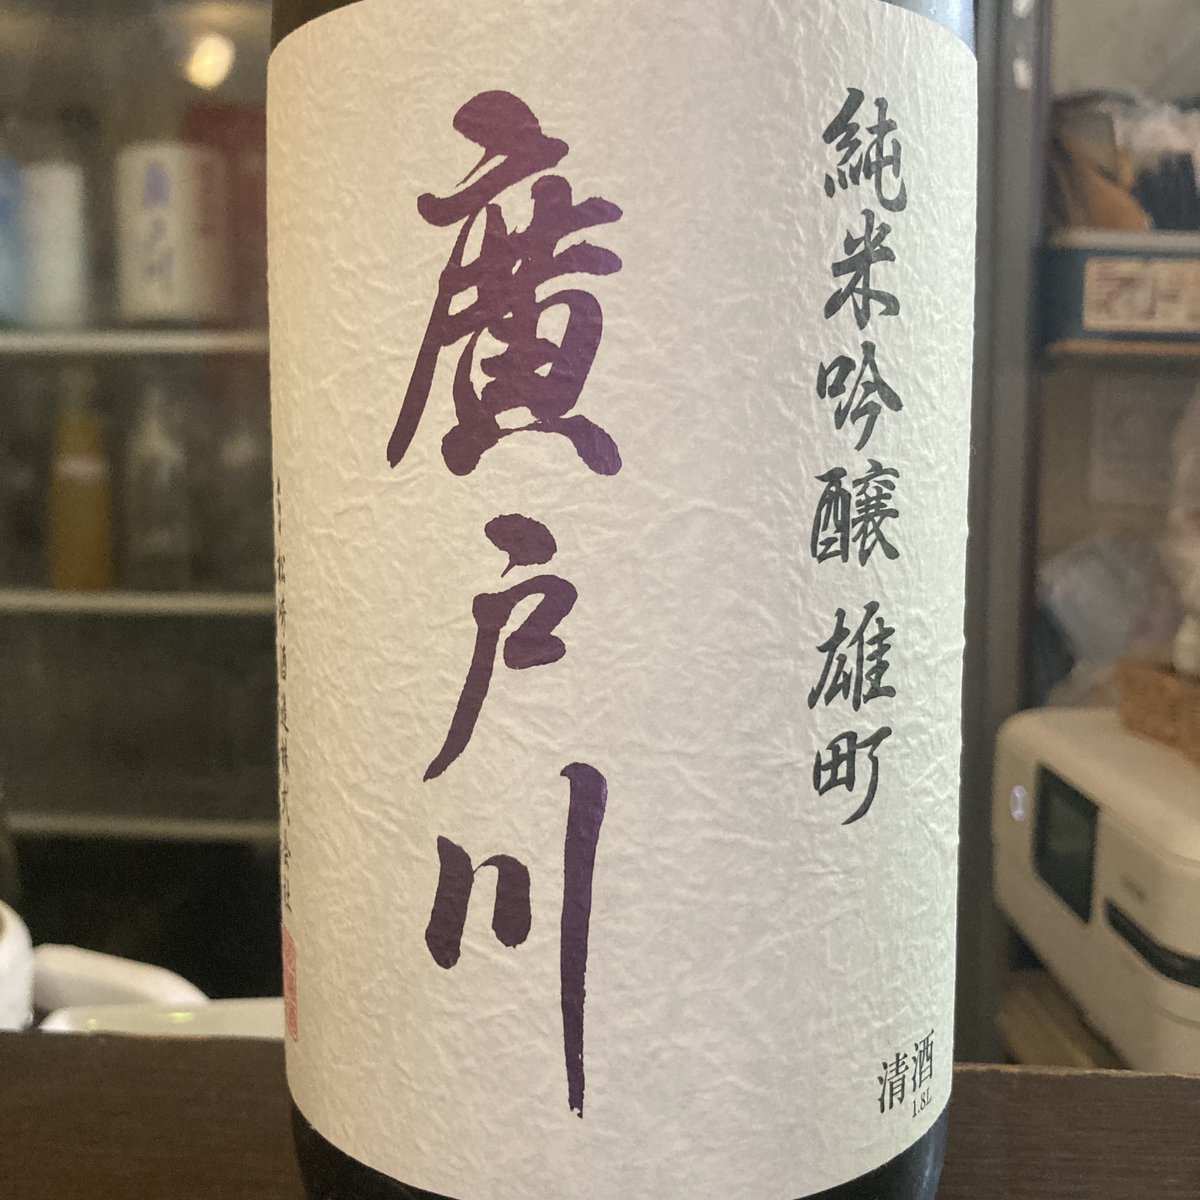 test ツイッターメディア - 福島県の松崎酒造さんより、廣戸川 純米吟醸 雄町!より瑞々しい味わいと香りを放つ雄町。これもまた凄く美味い。 #廣戸川 #松崎酒造 https://t.co/BcFy35VyXx